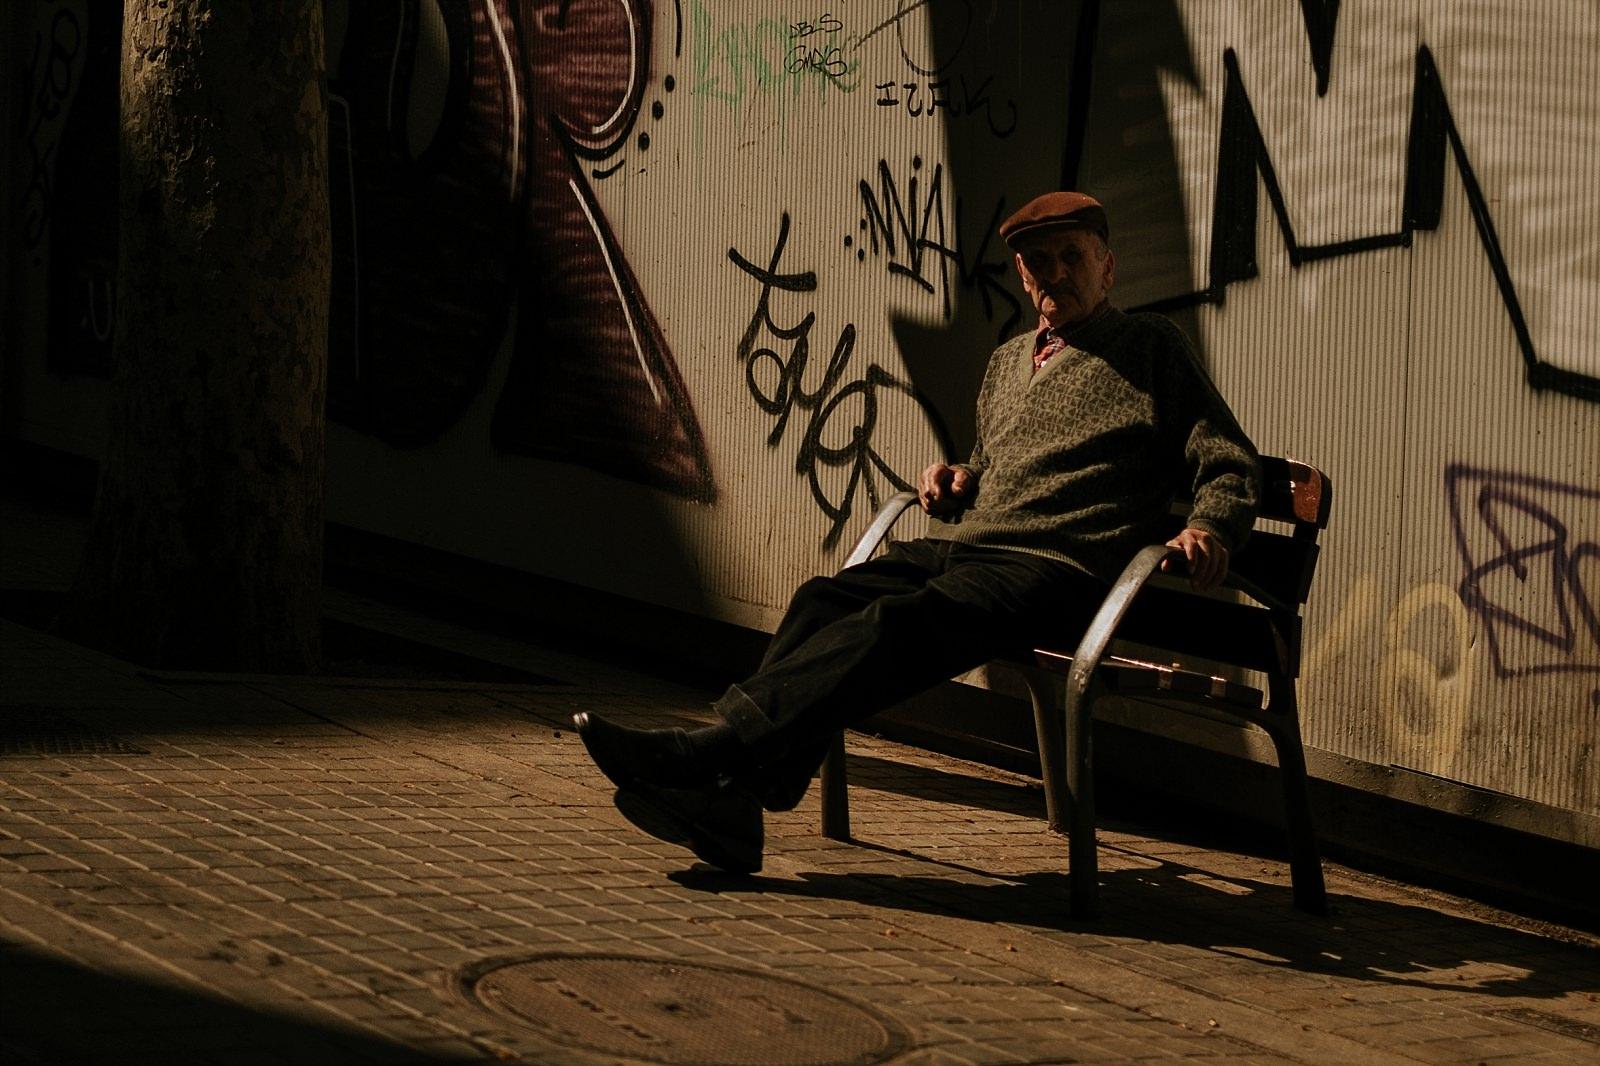 Fotografo en Barcelona